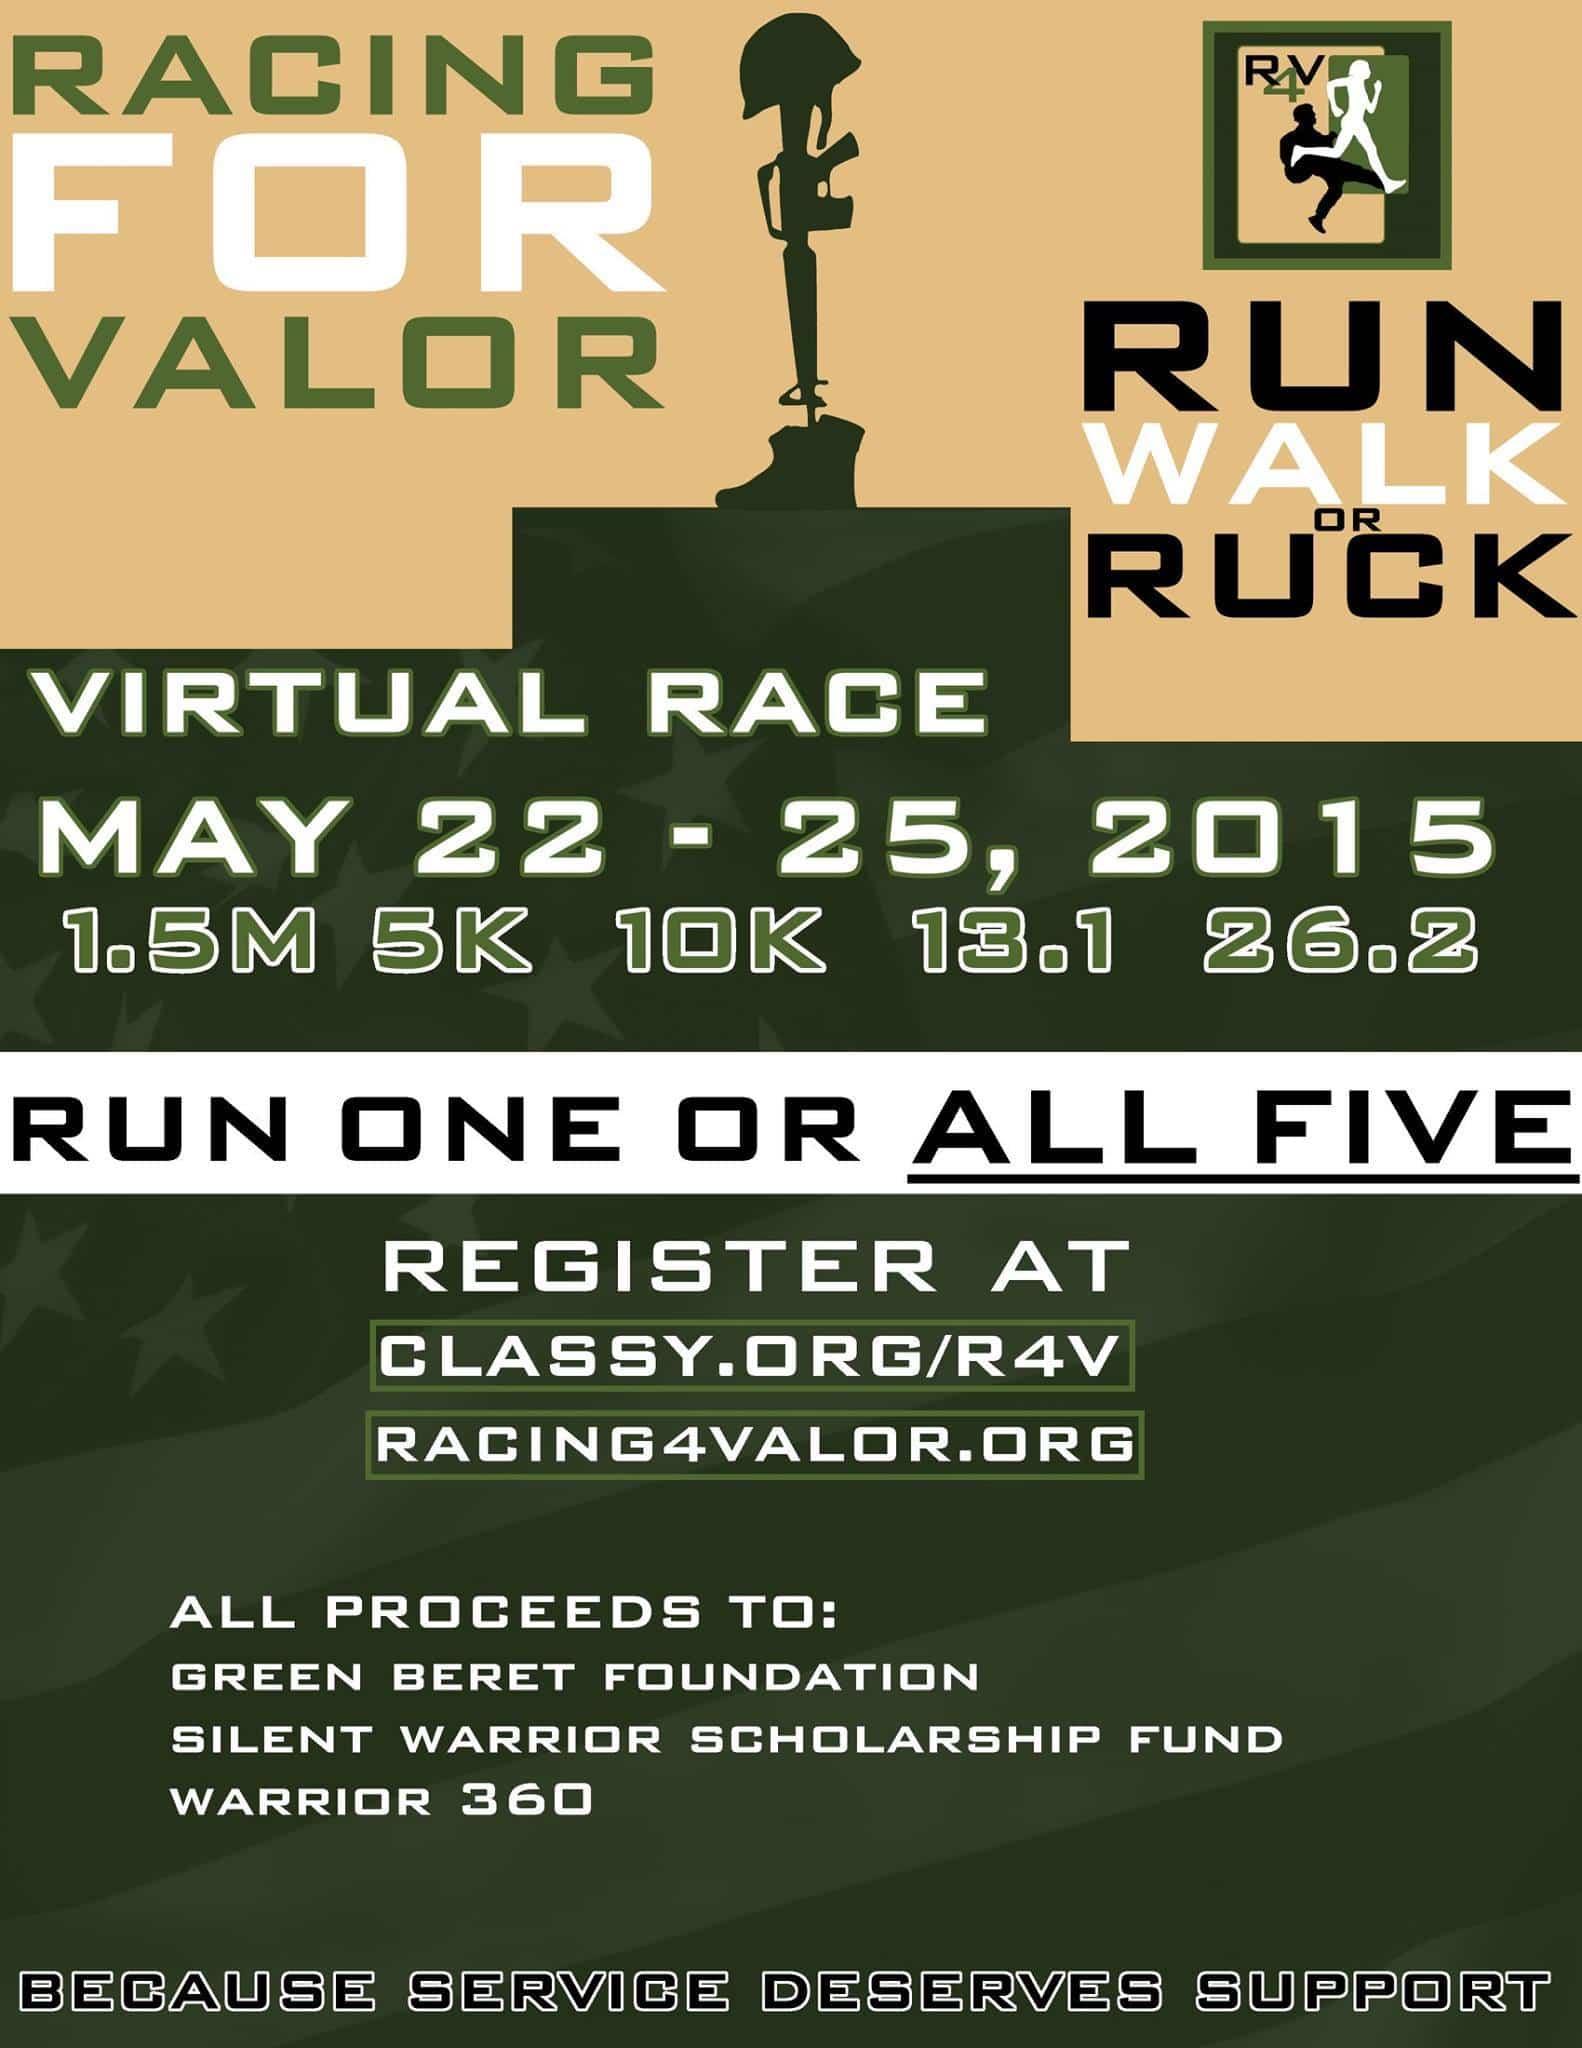 Racing For Valor 2015 Memorial Run Flyer